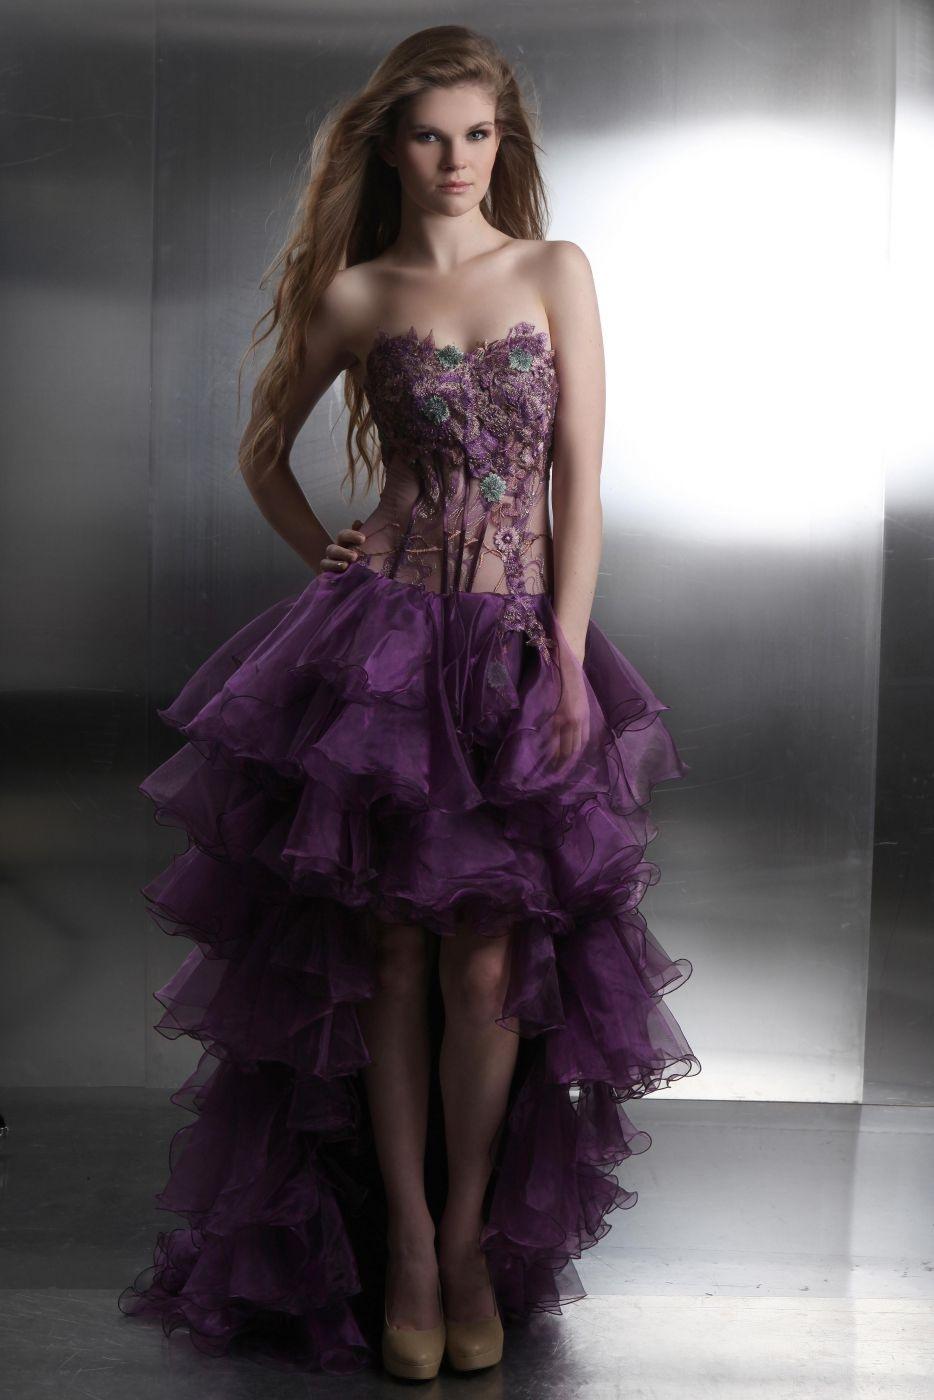 20 Elegant Flieder Kleid Lang StylishDesigner Ausgezeichnet Flieder Kleid Lang Design